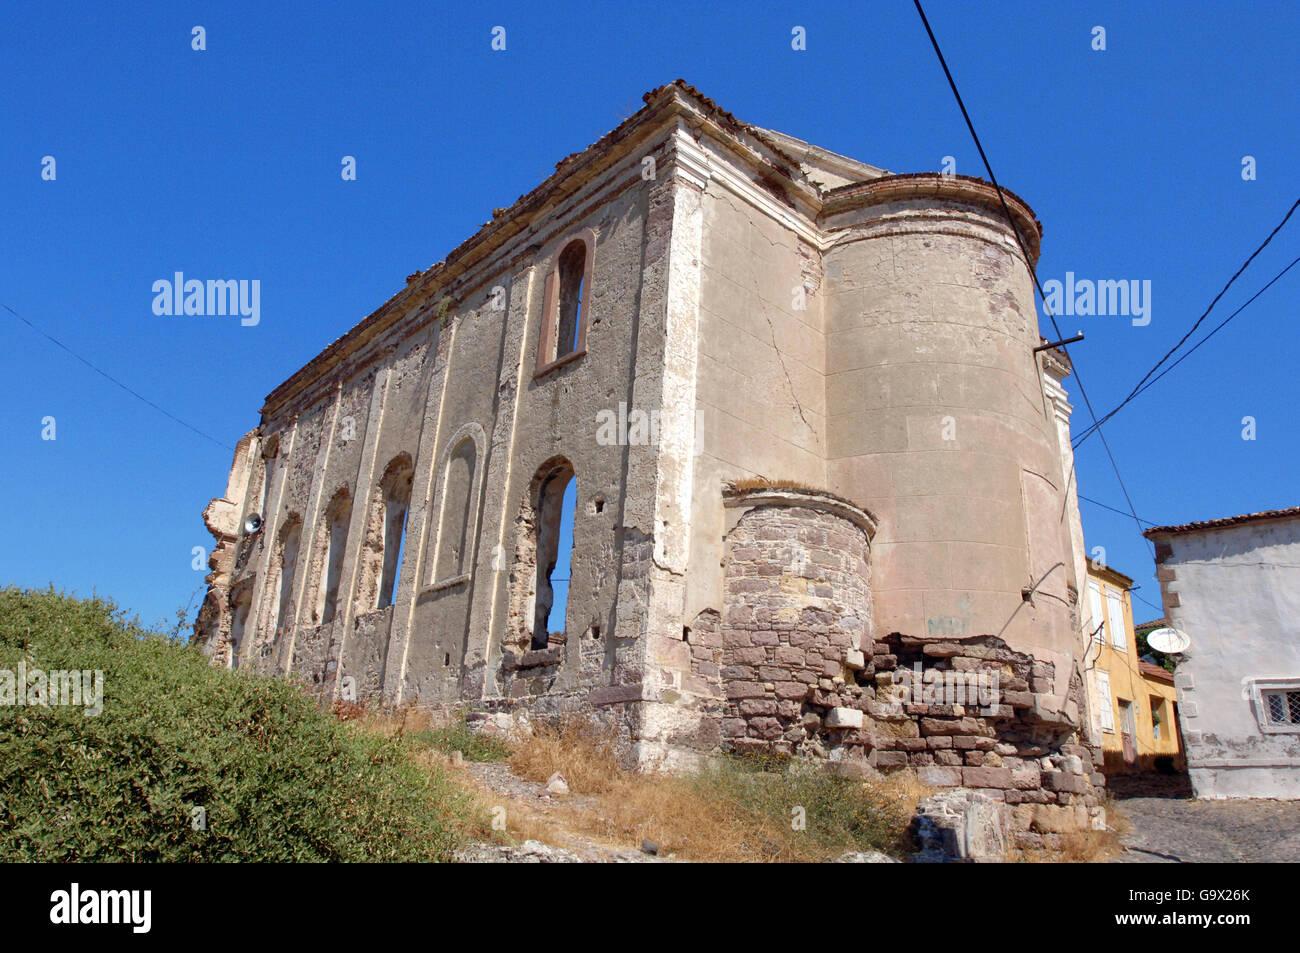 Ruin of Panaya church, Ayvalik, Cunda, Balikesir, Turkey, Asia / Ayvalik - Stock Image